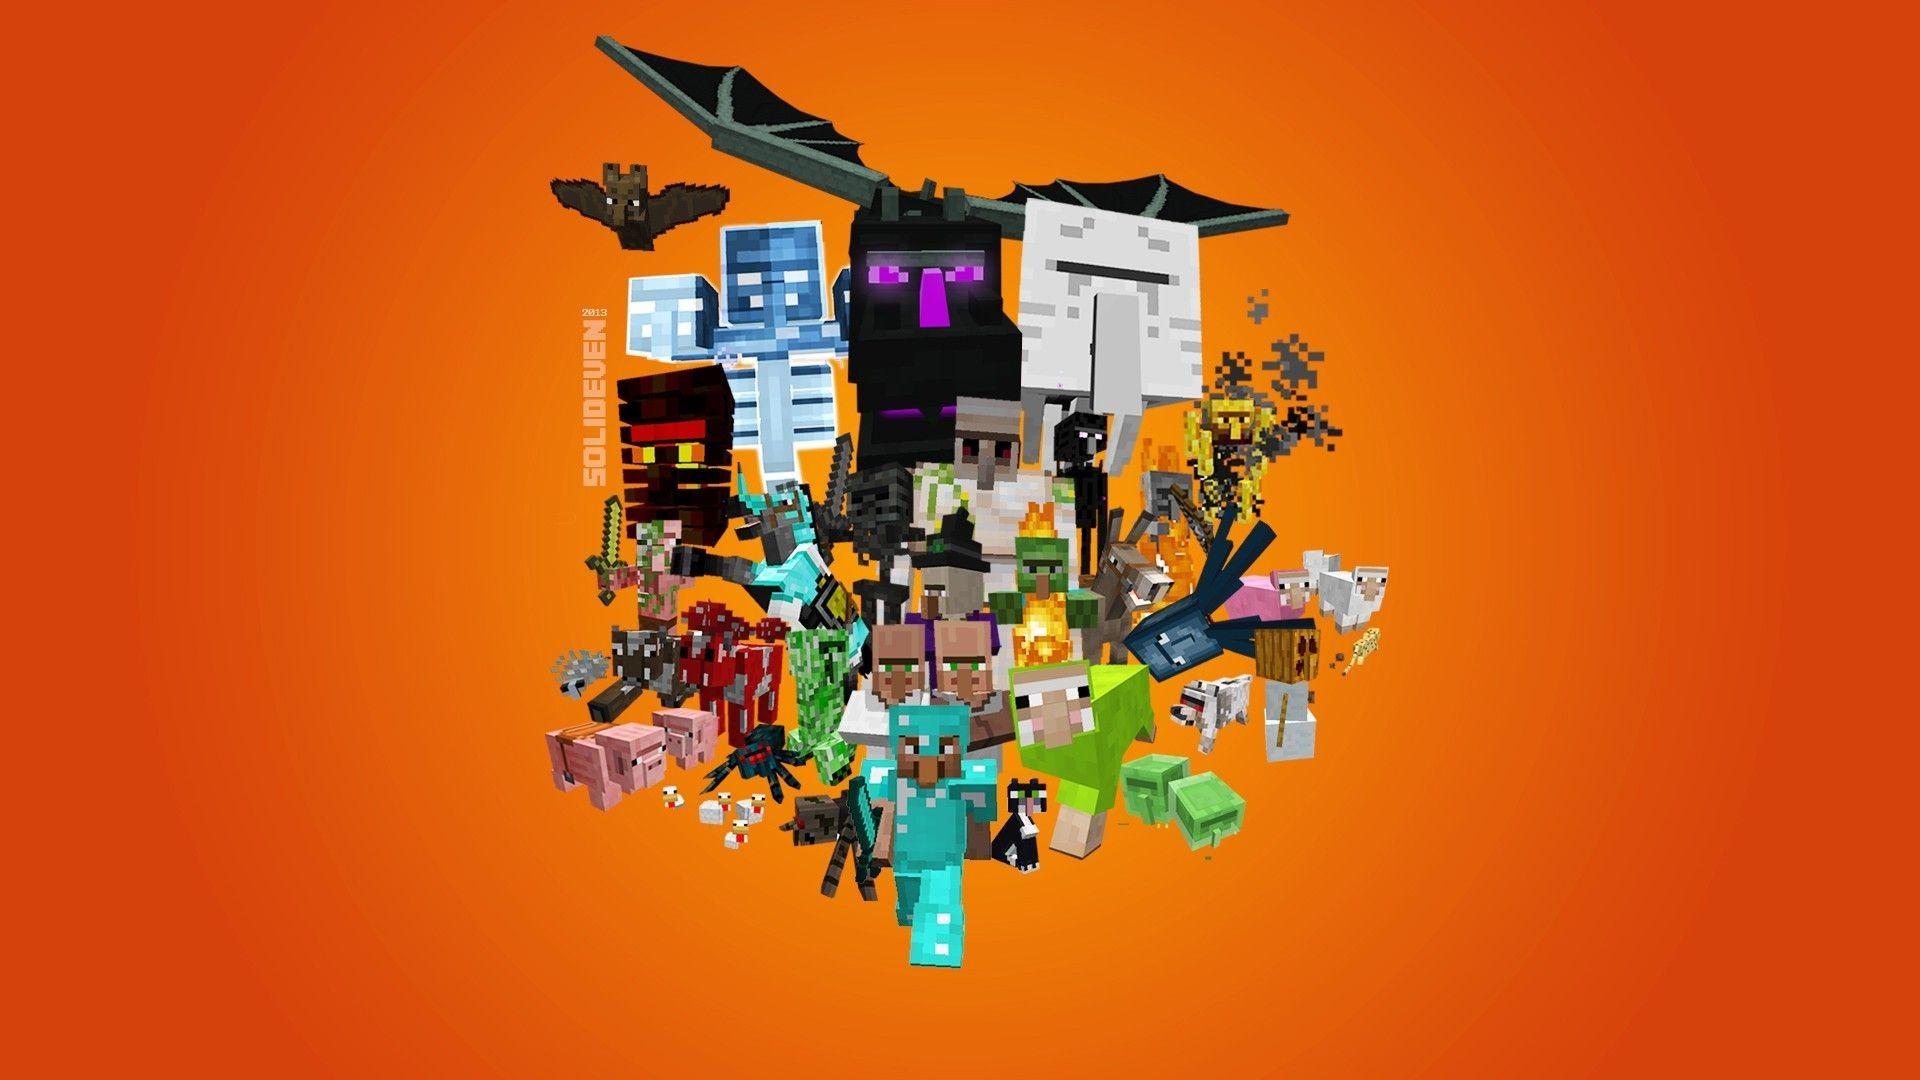 Top Wallpaper Minecraft Thanksgiving - 1016456-minecraft-background-1920x1080-for-ipad-2  Gallery_682886.jpg